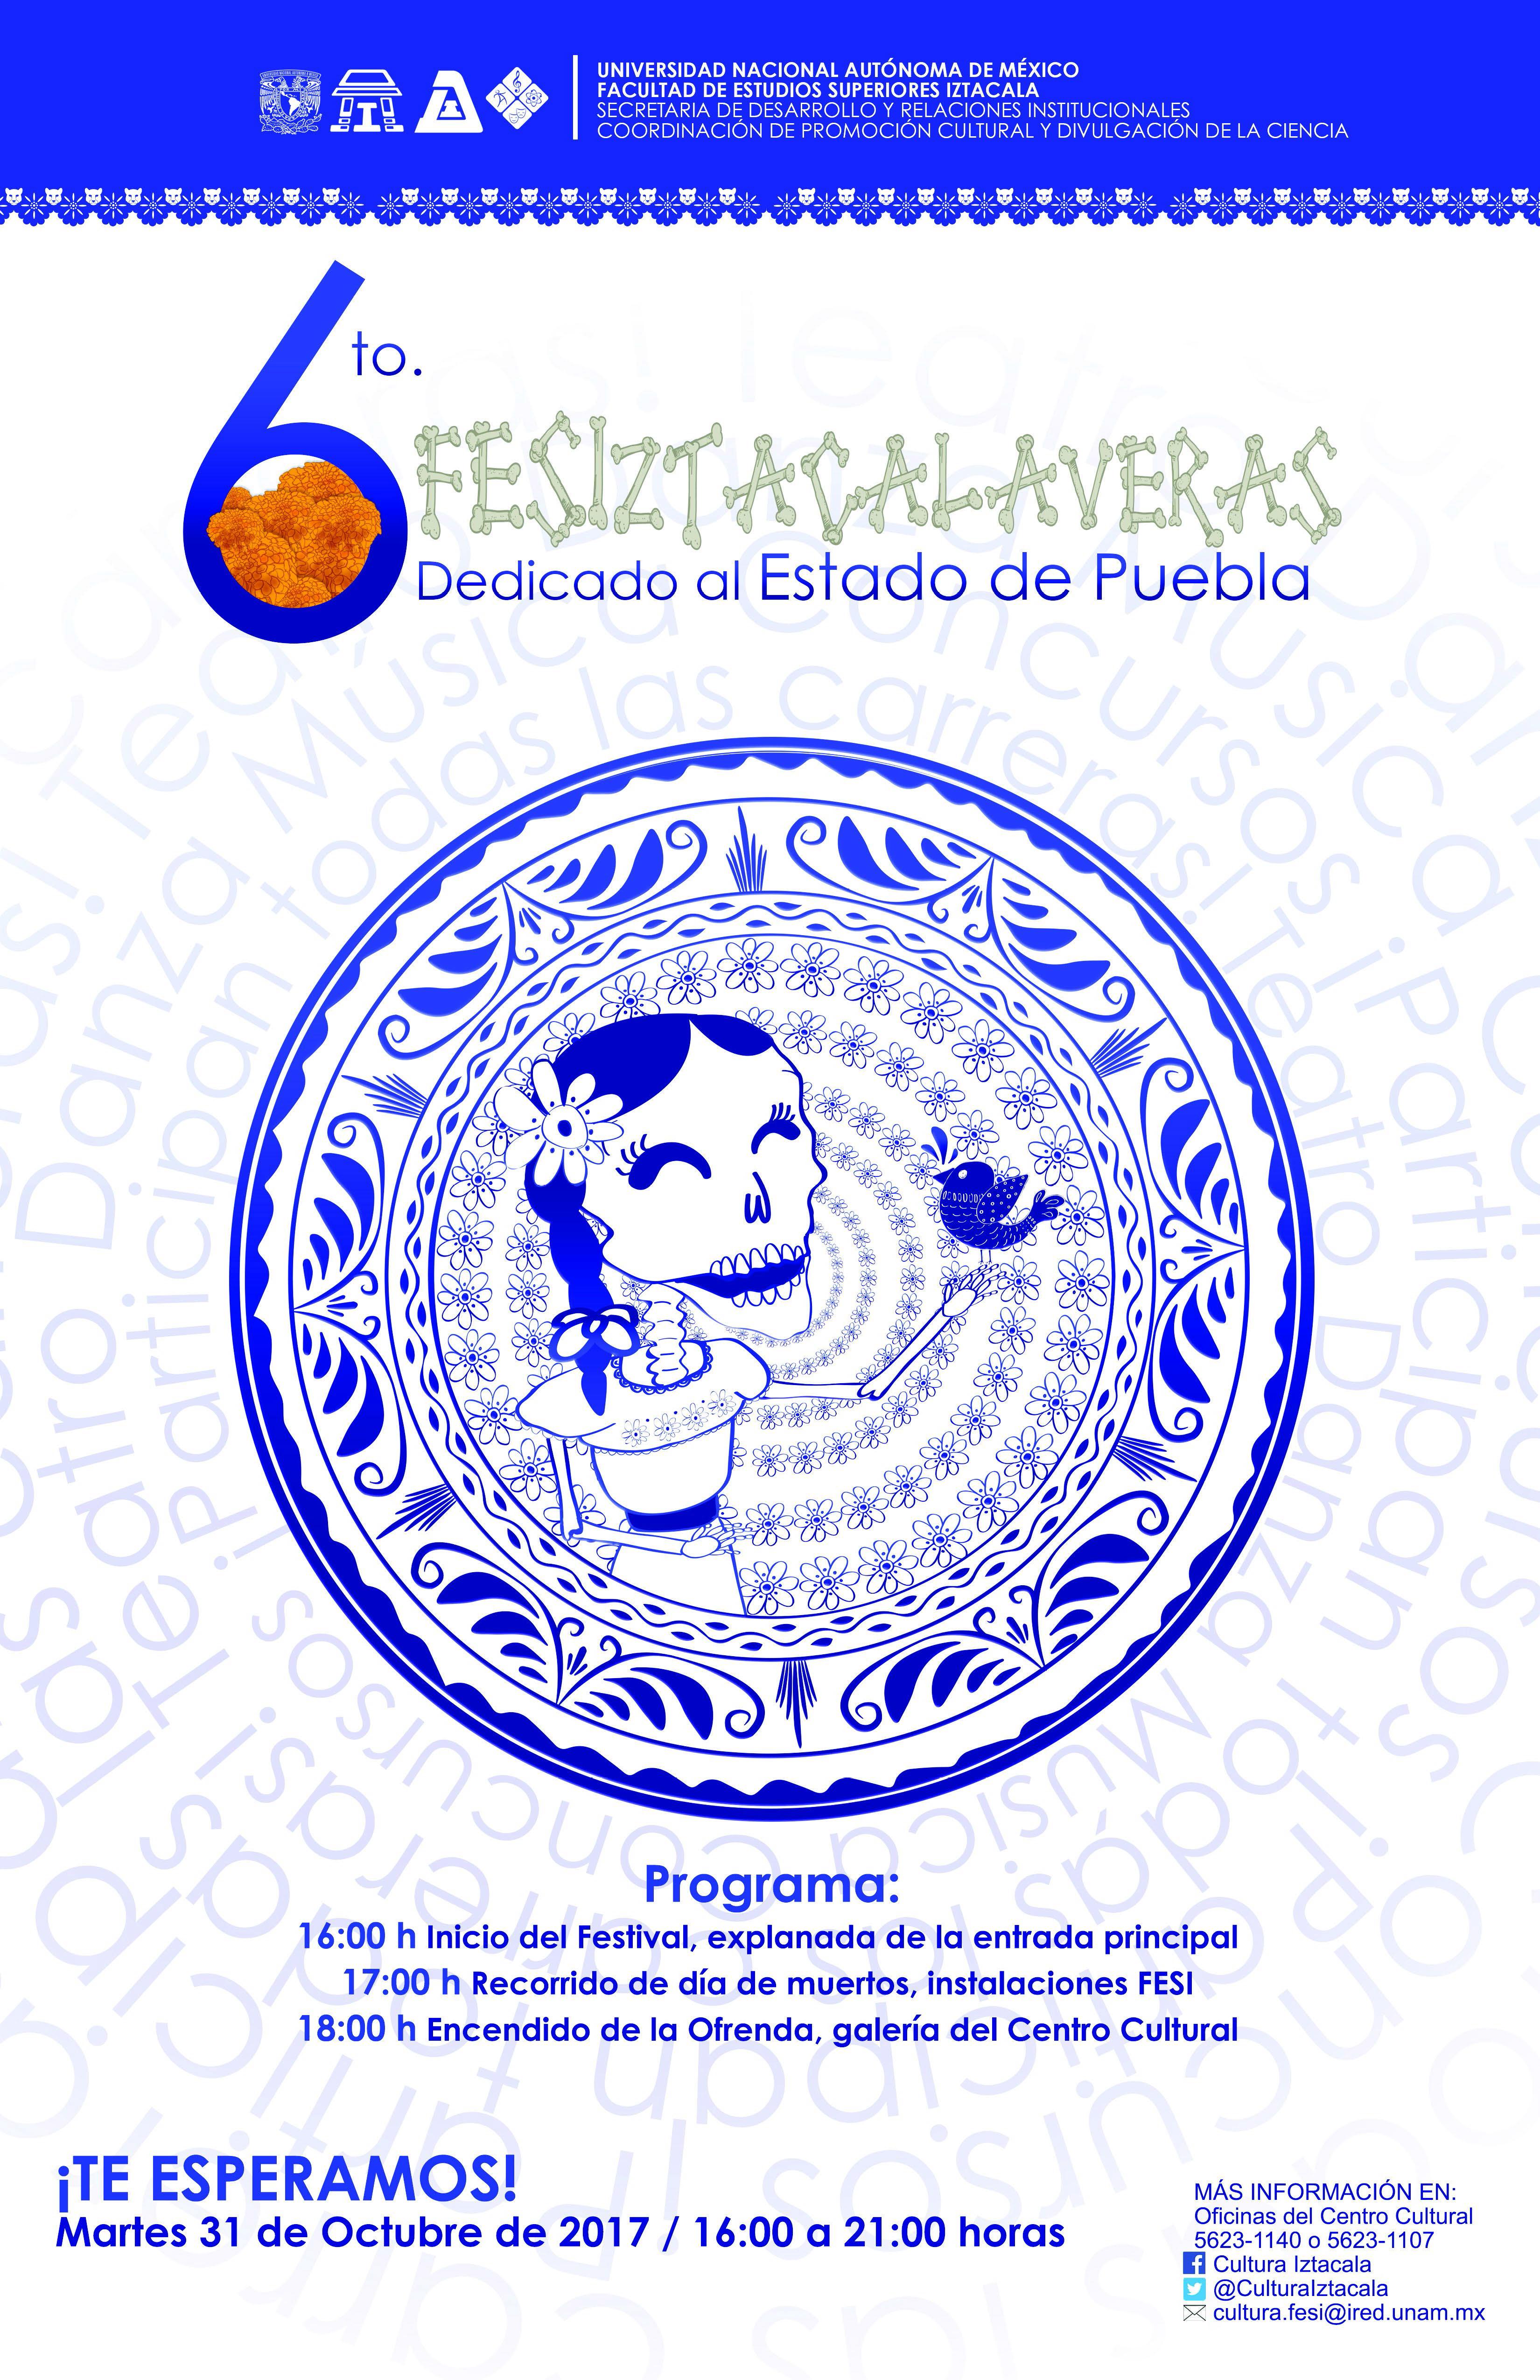 Sexto FESIztacalaveras 2017